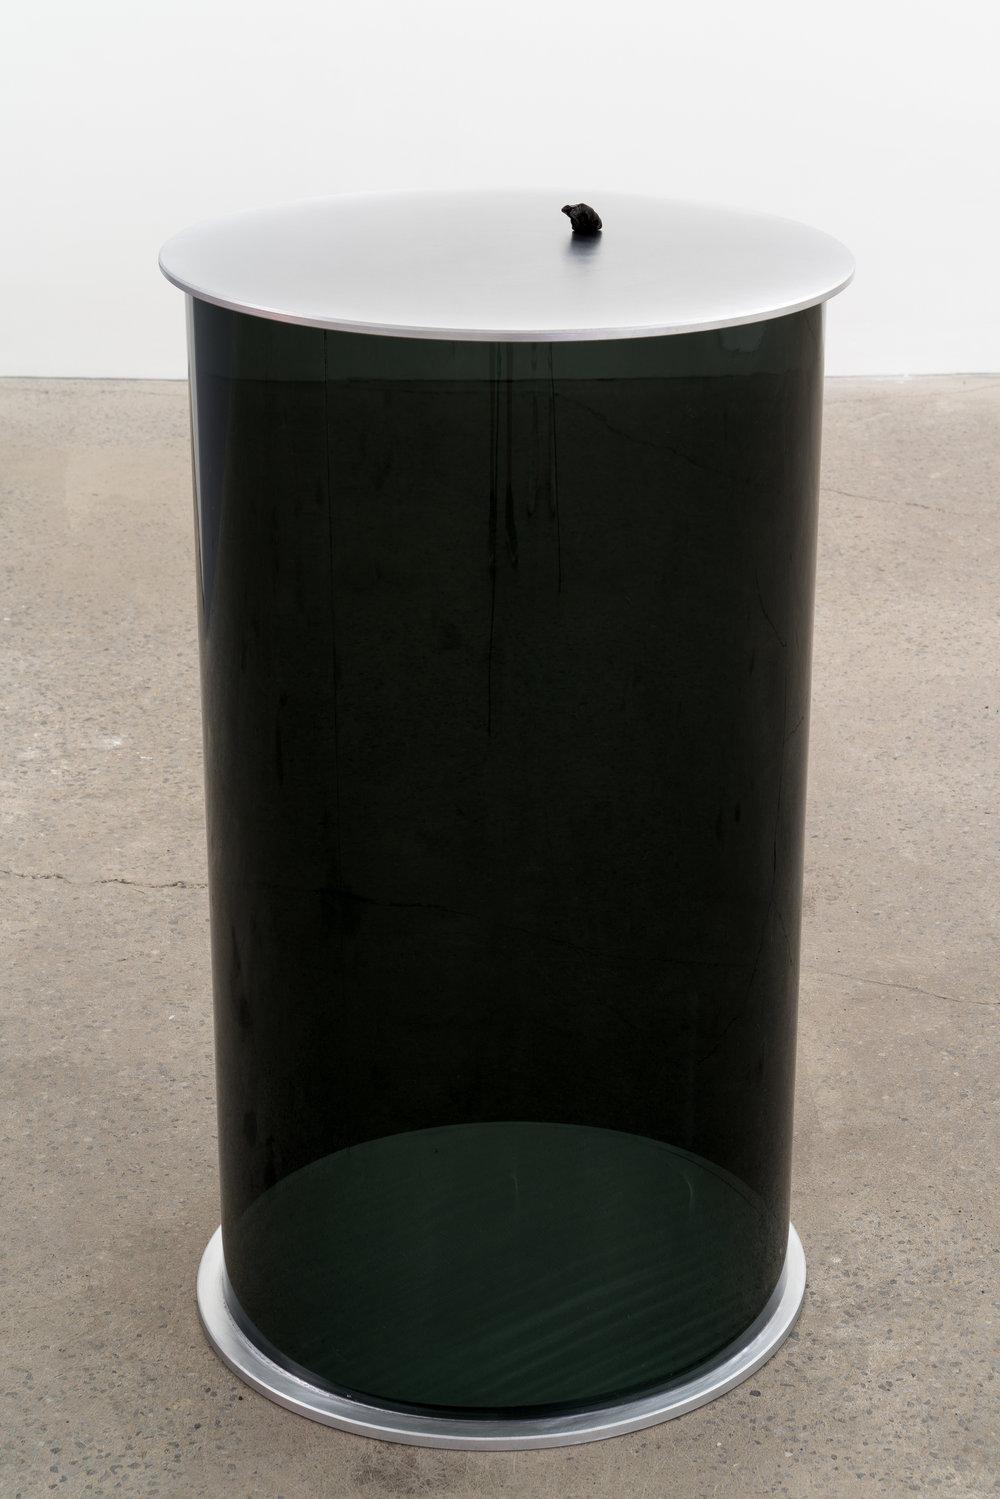 "Carl Trahan, Der Rib, 2018, météorite, plexiglas et aluminium, 94 x 53 x 53 cm (37"" x 21.5"" x 21.5"")"